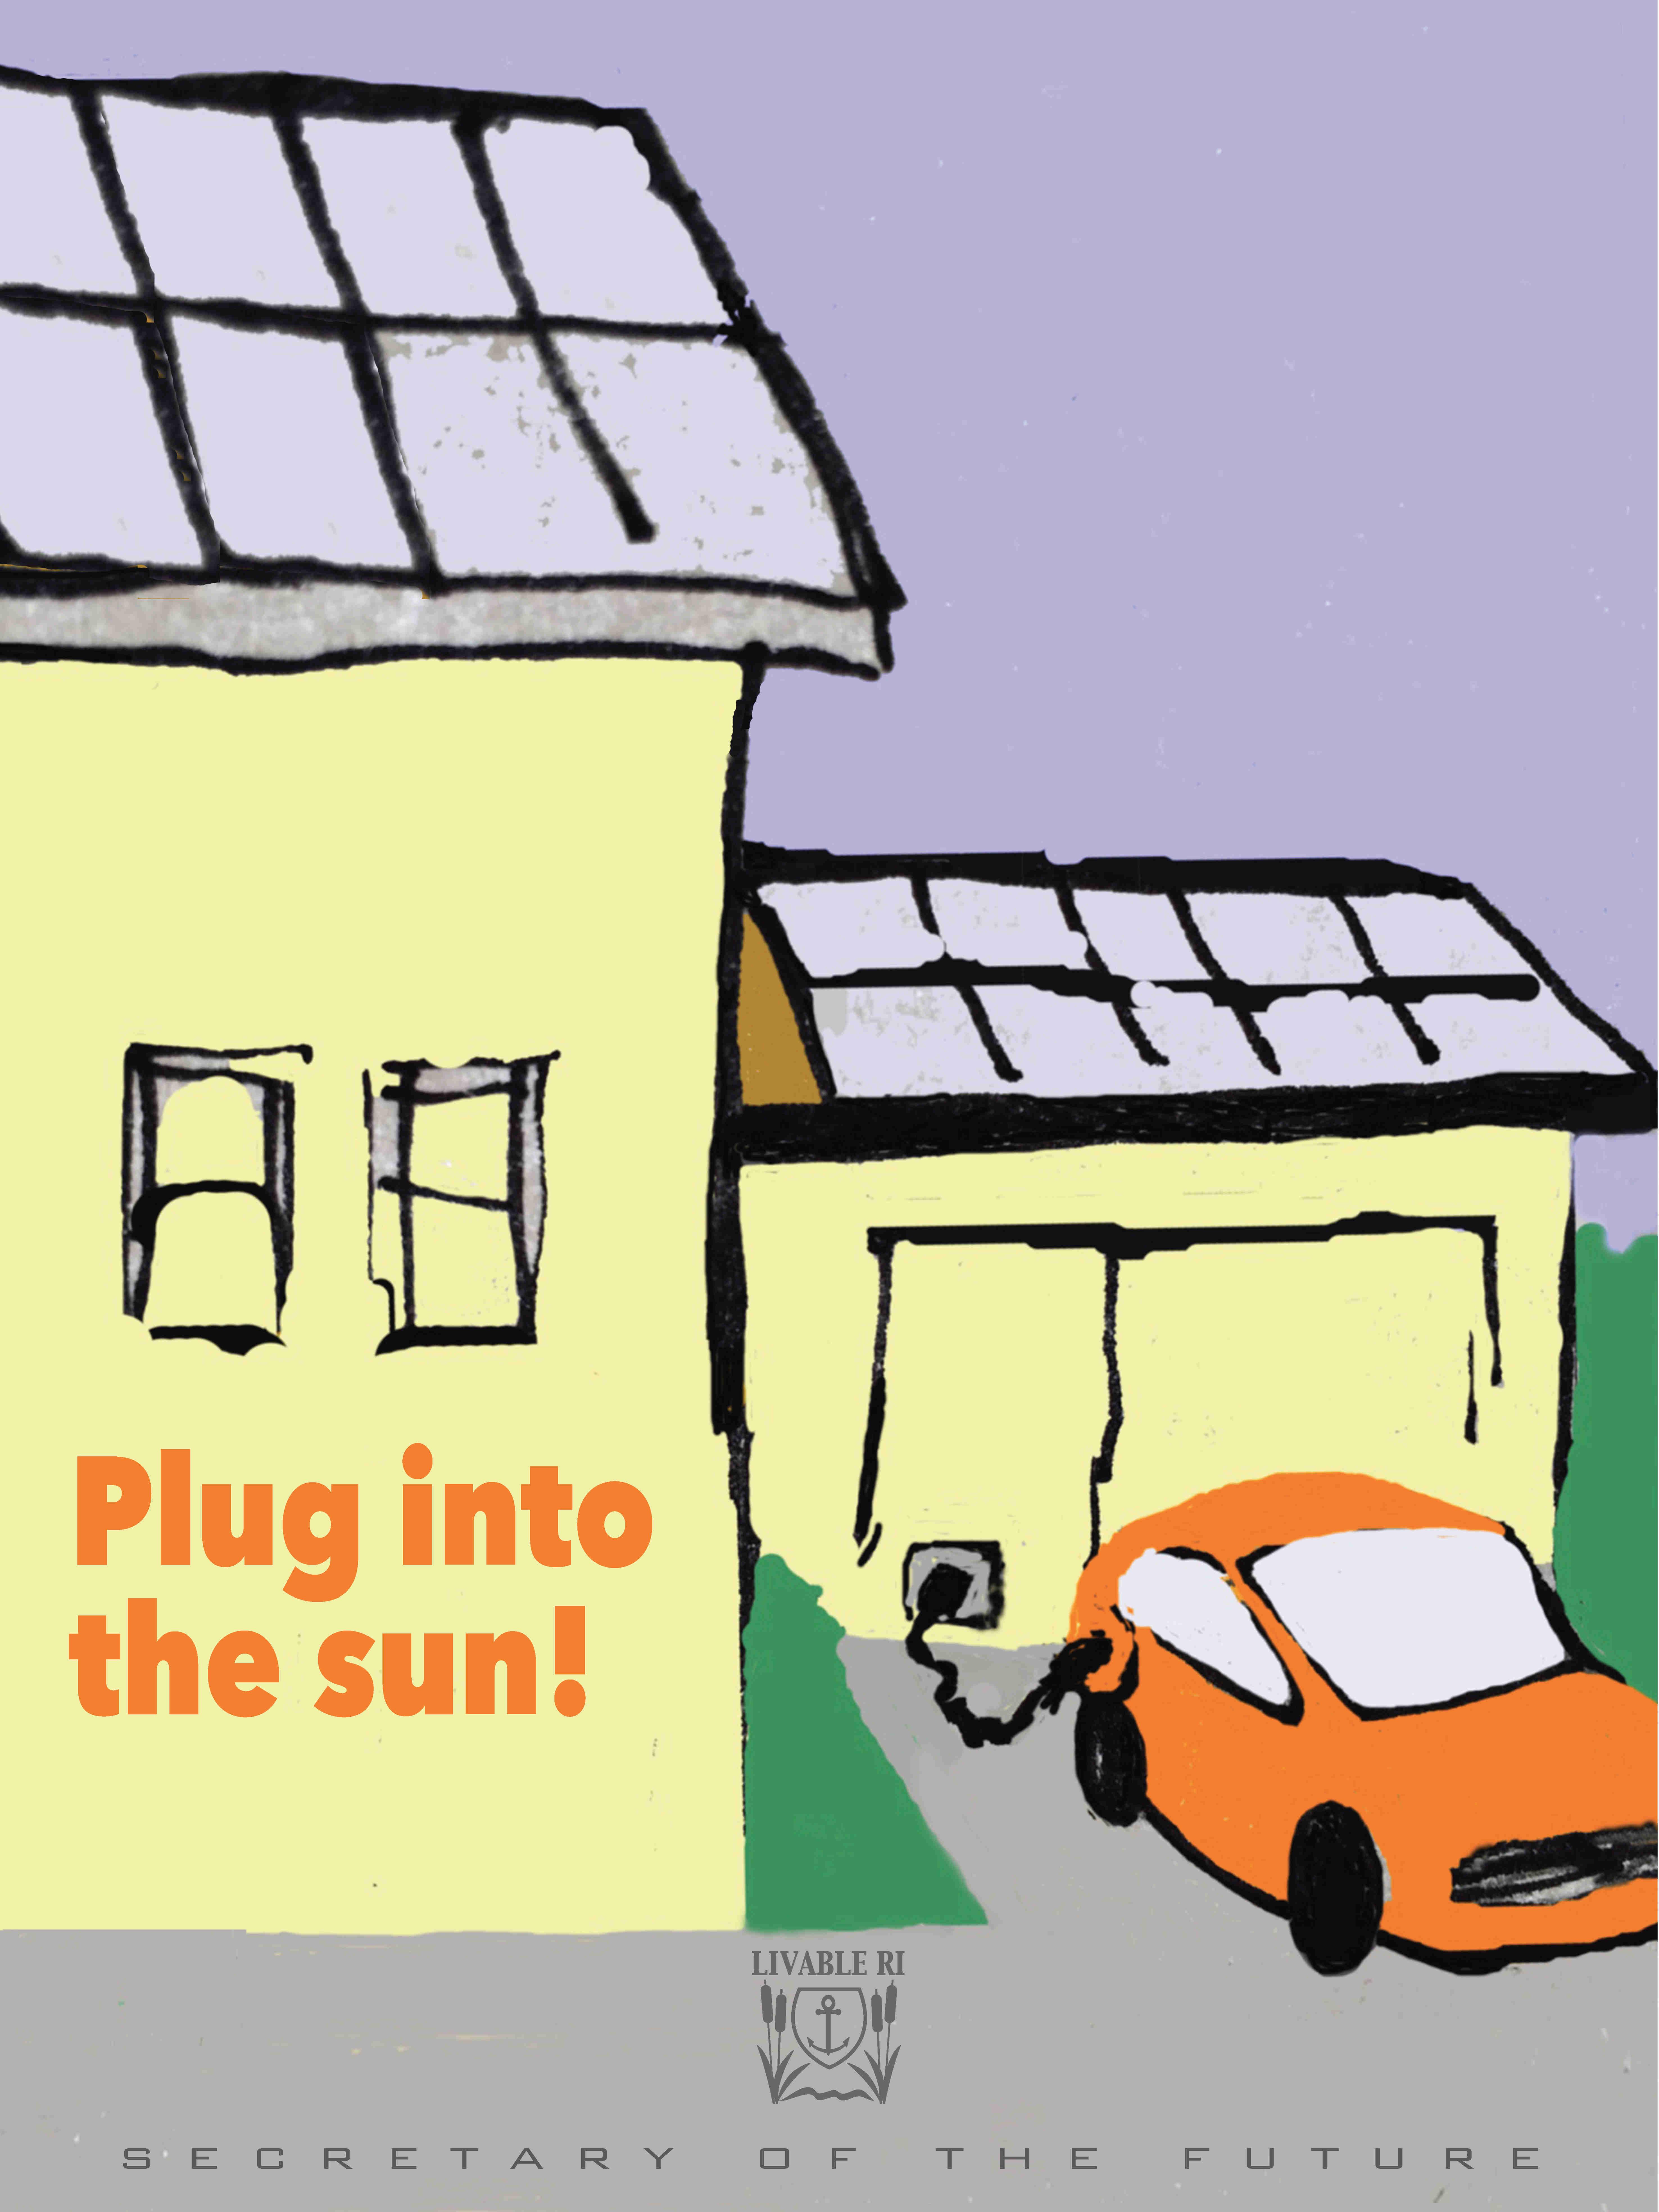 Electric_Car_Poster3_18x24_final